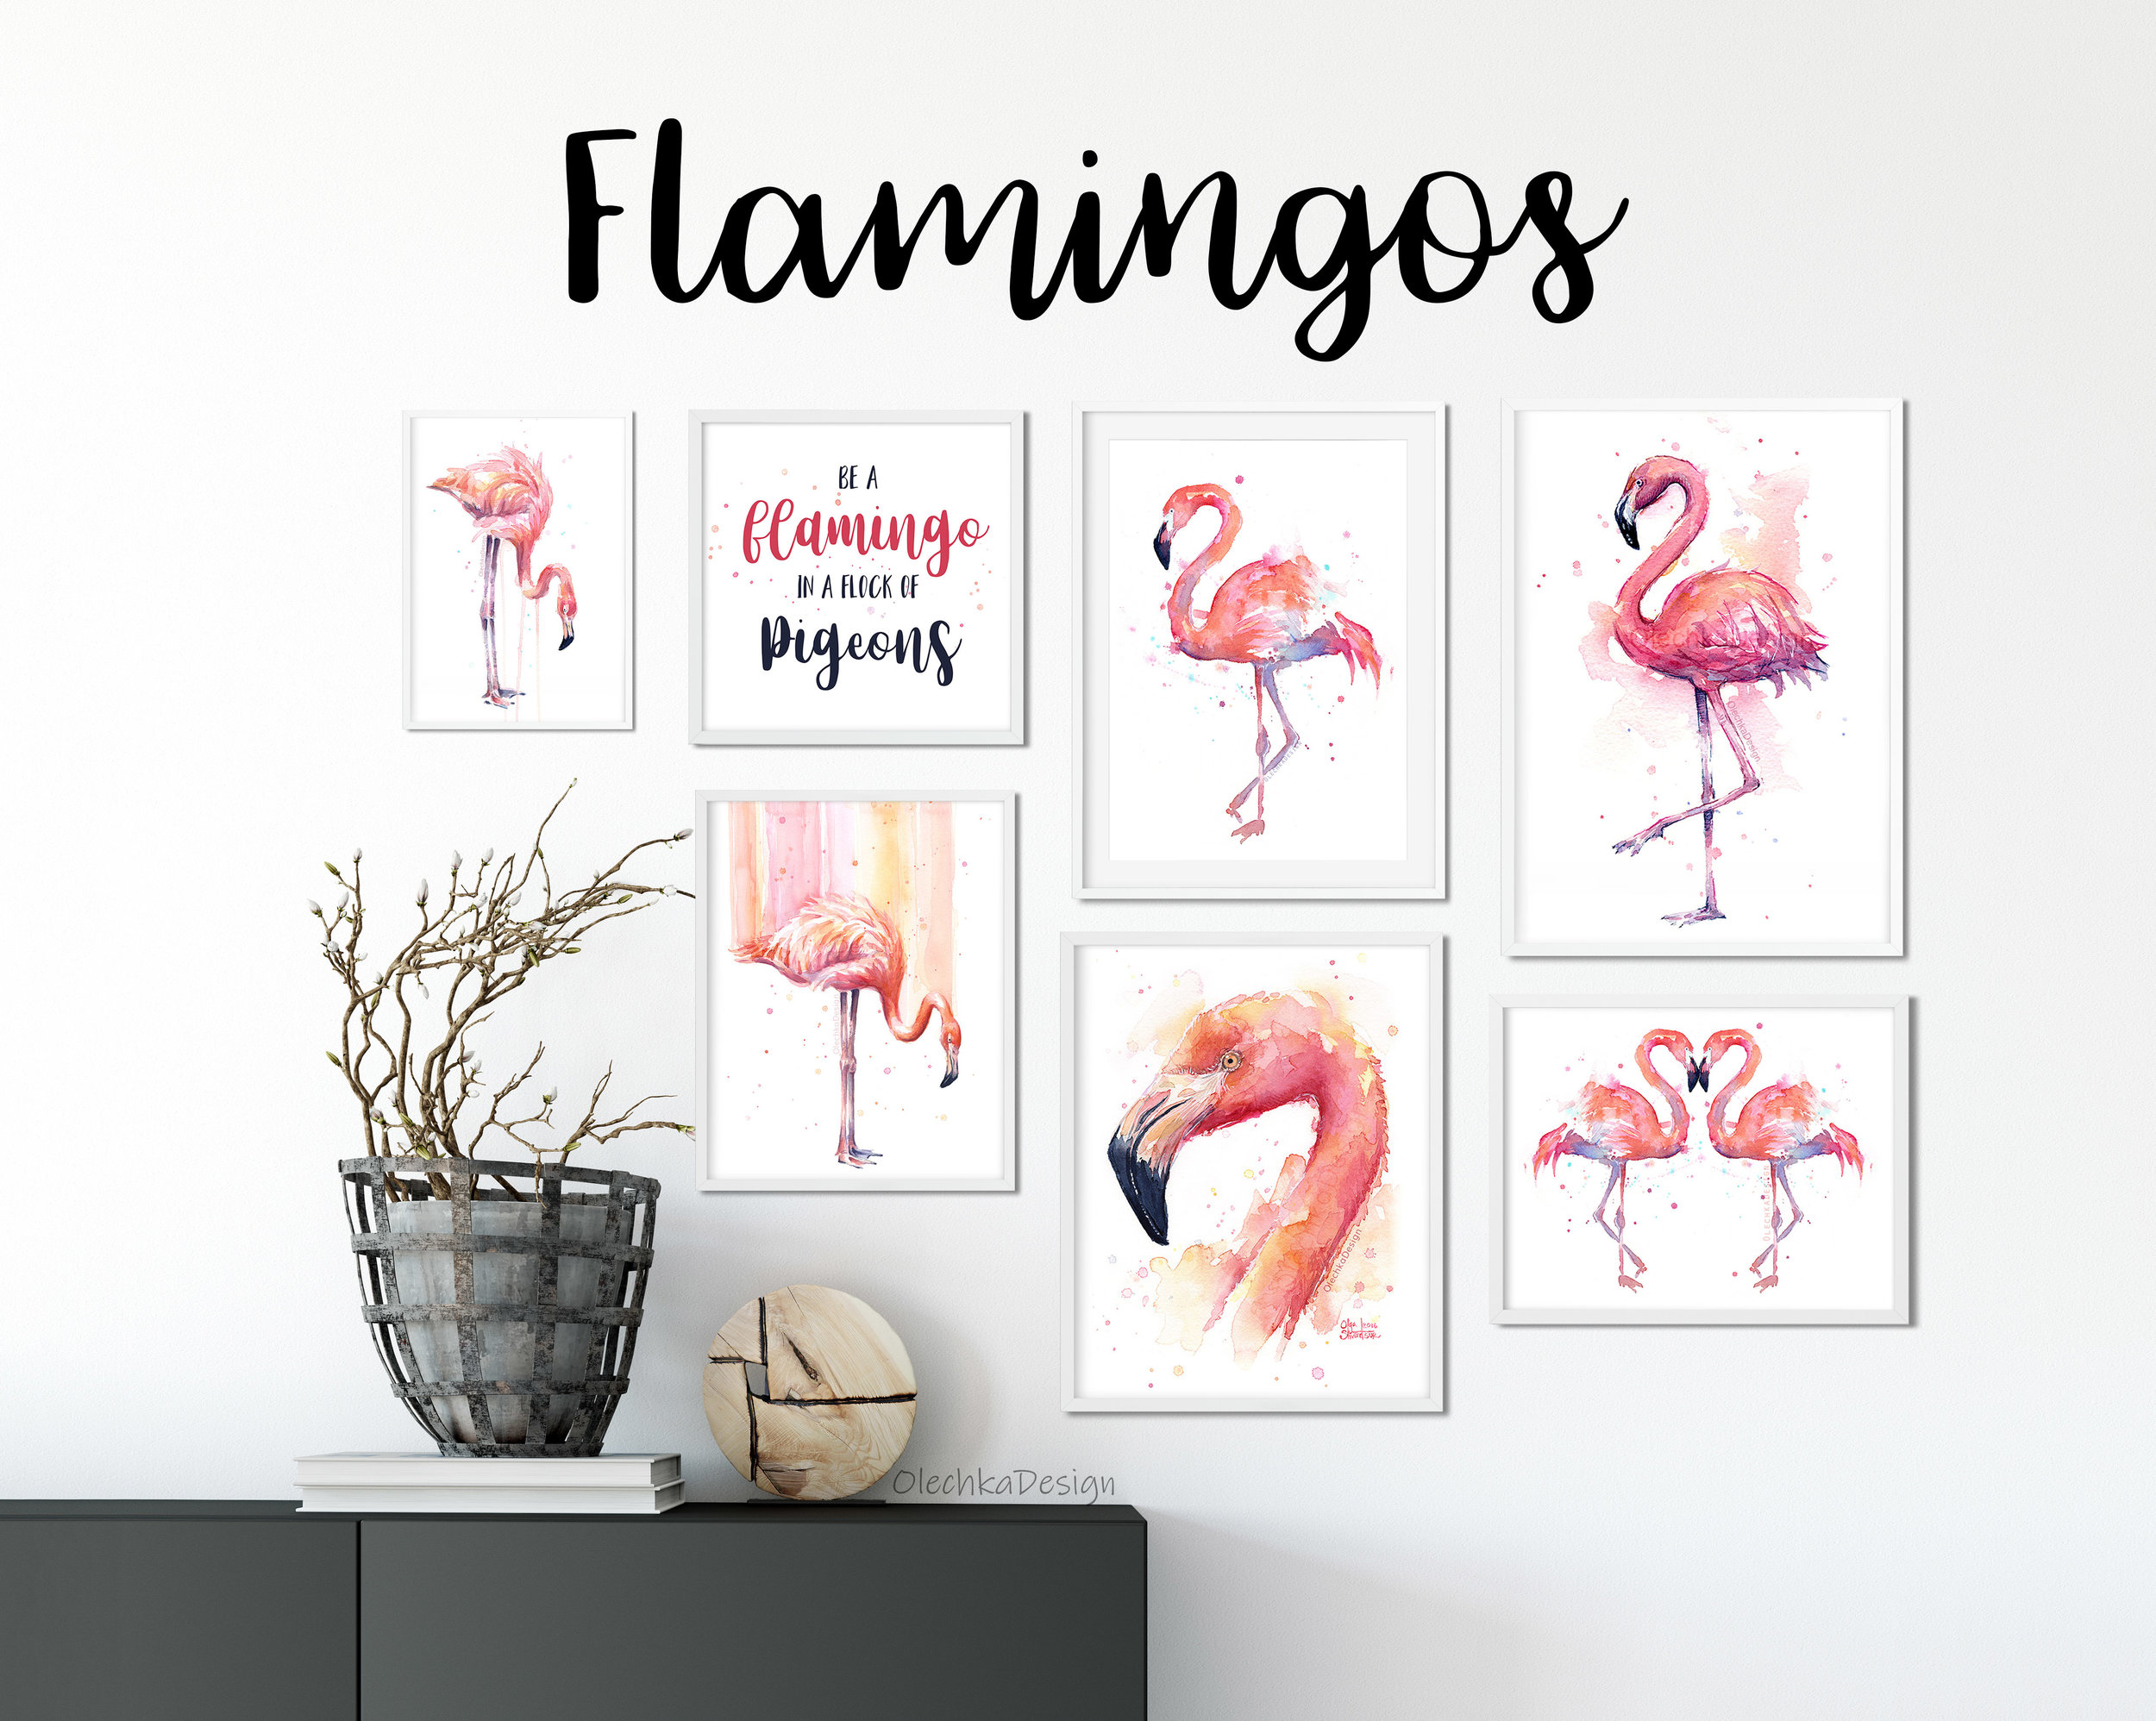 flamingo-wall-art.jpg